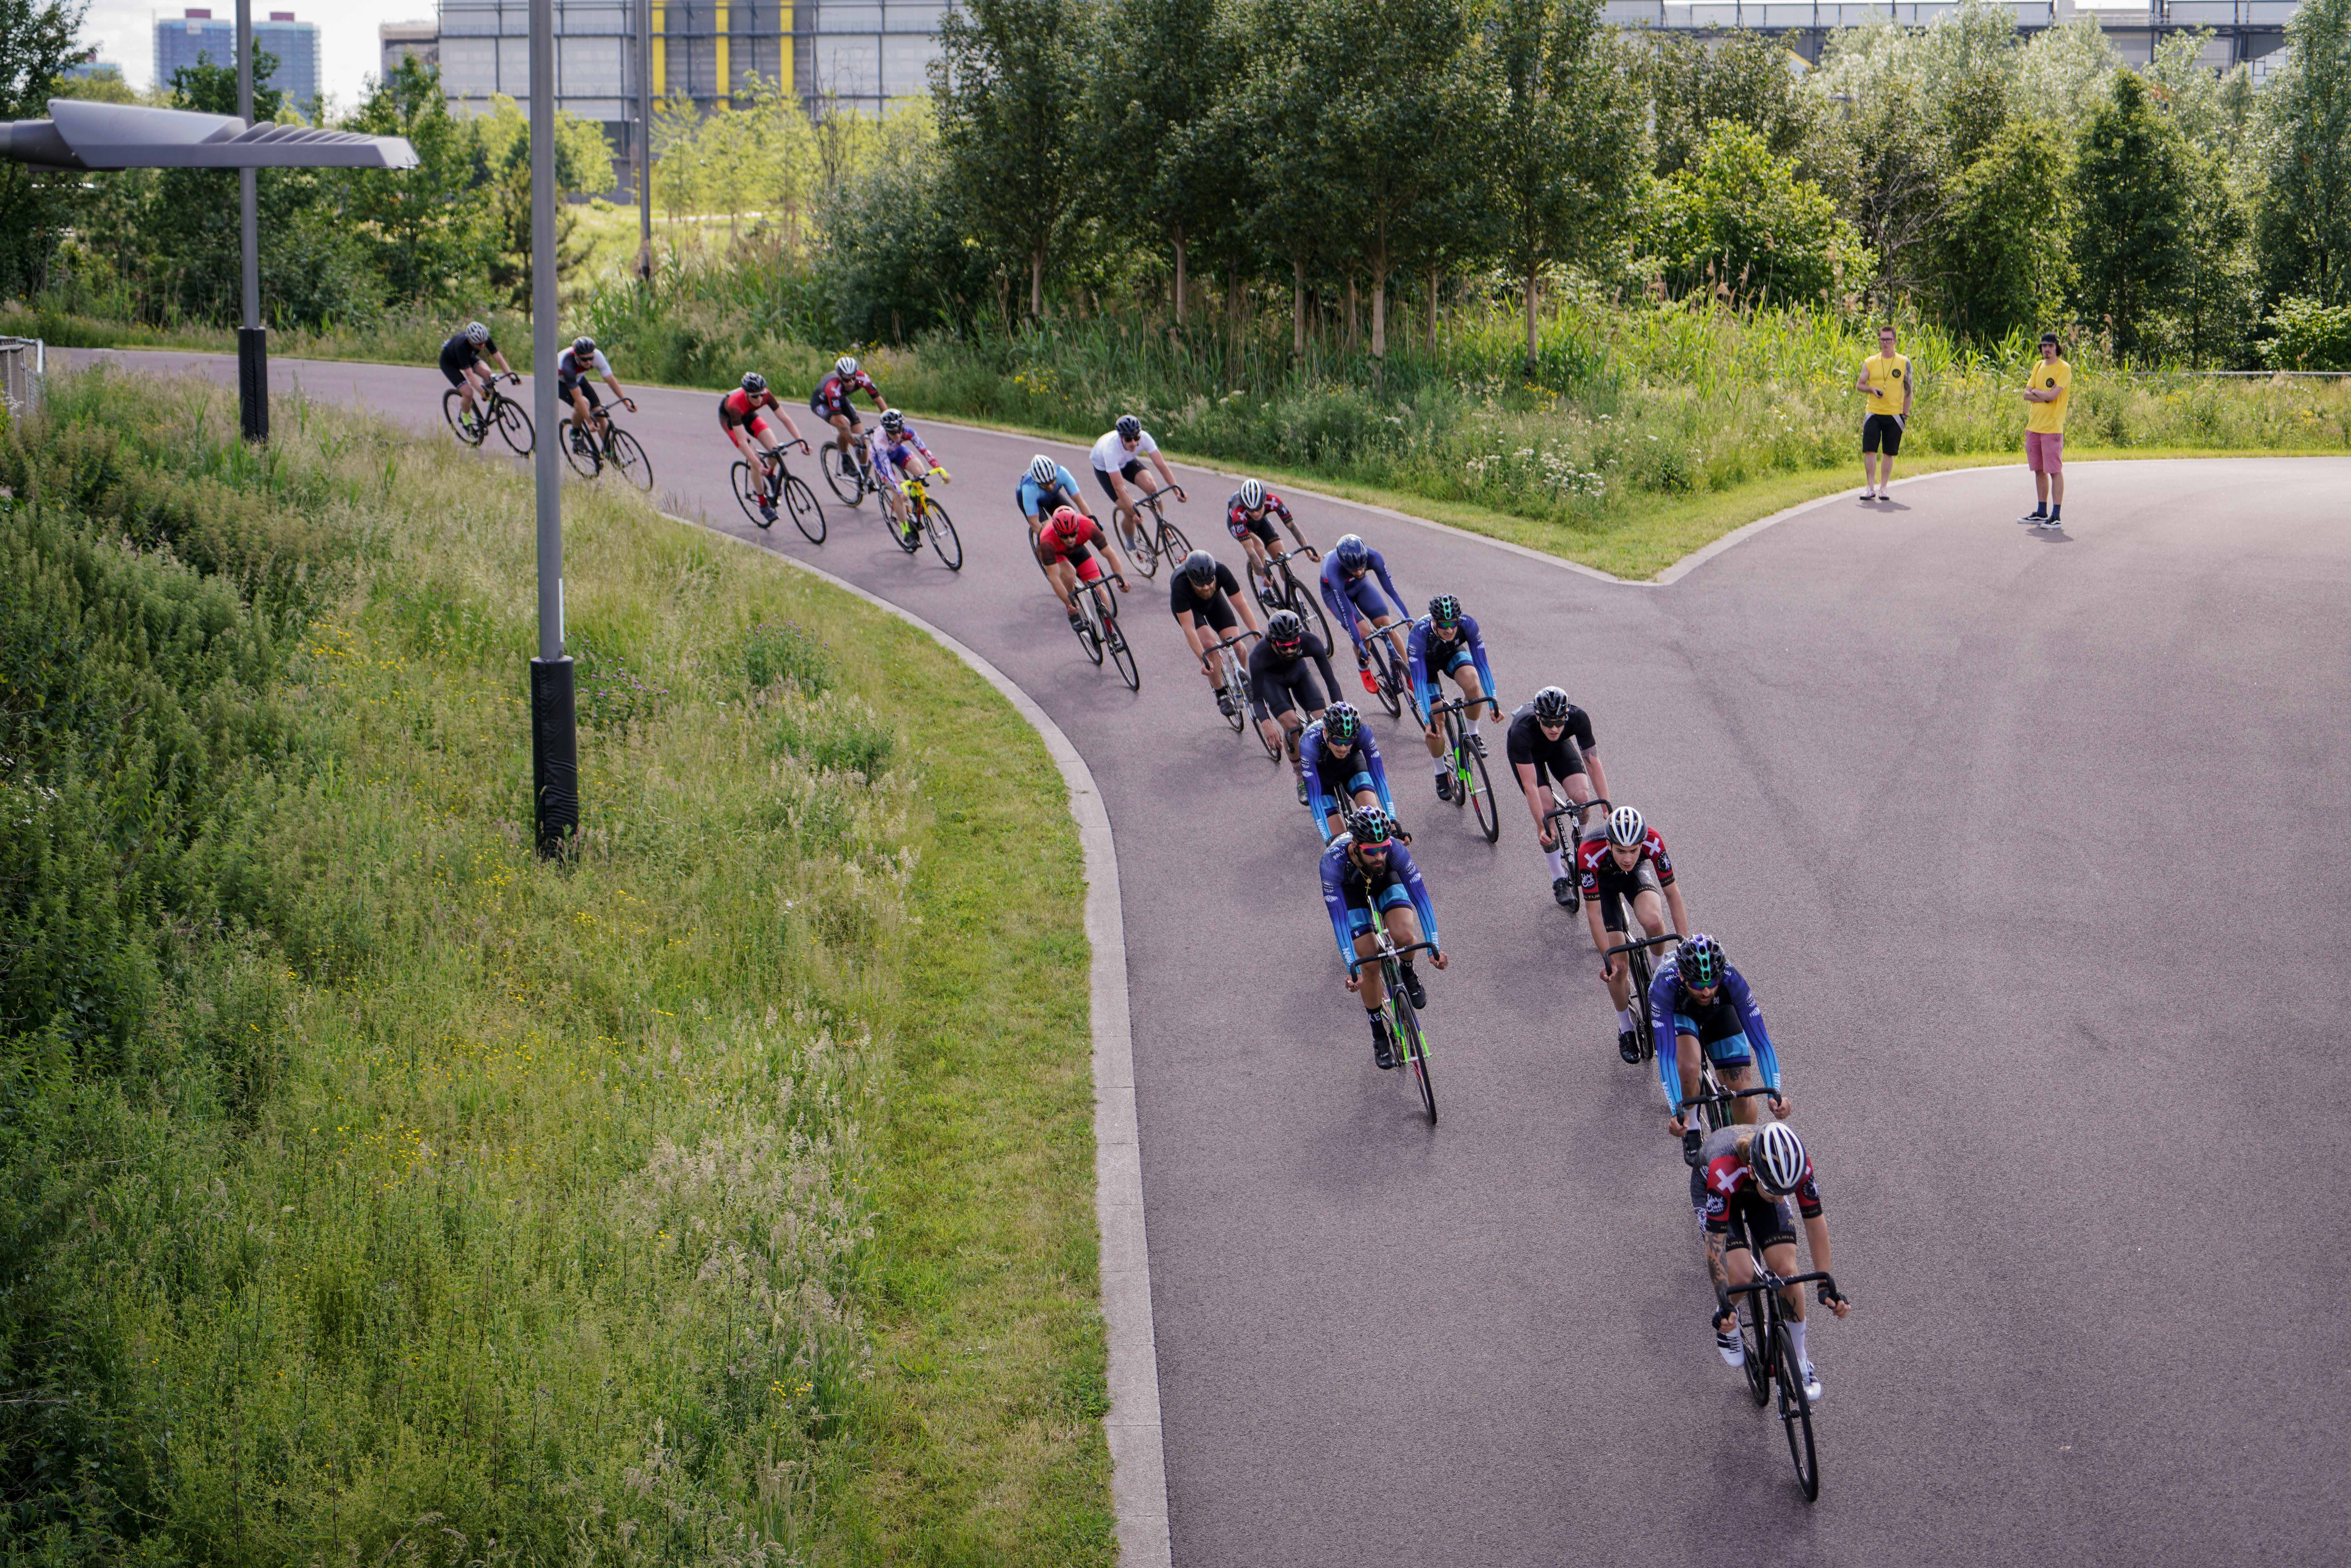 bike riders on road near trees